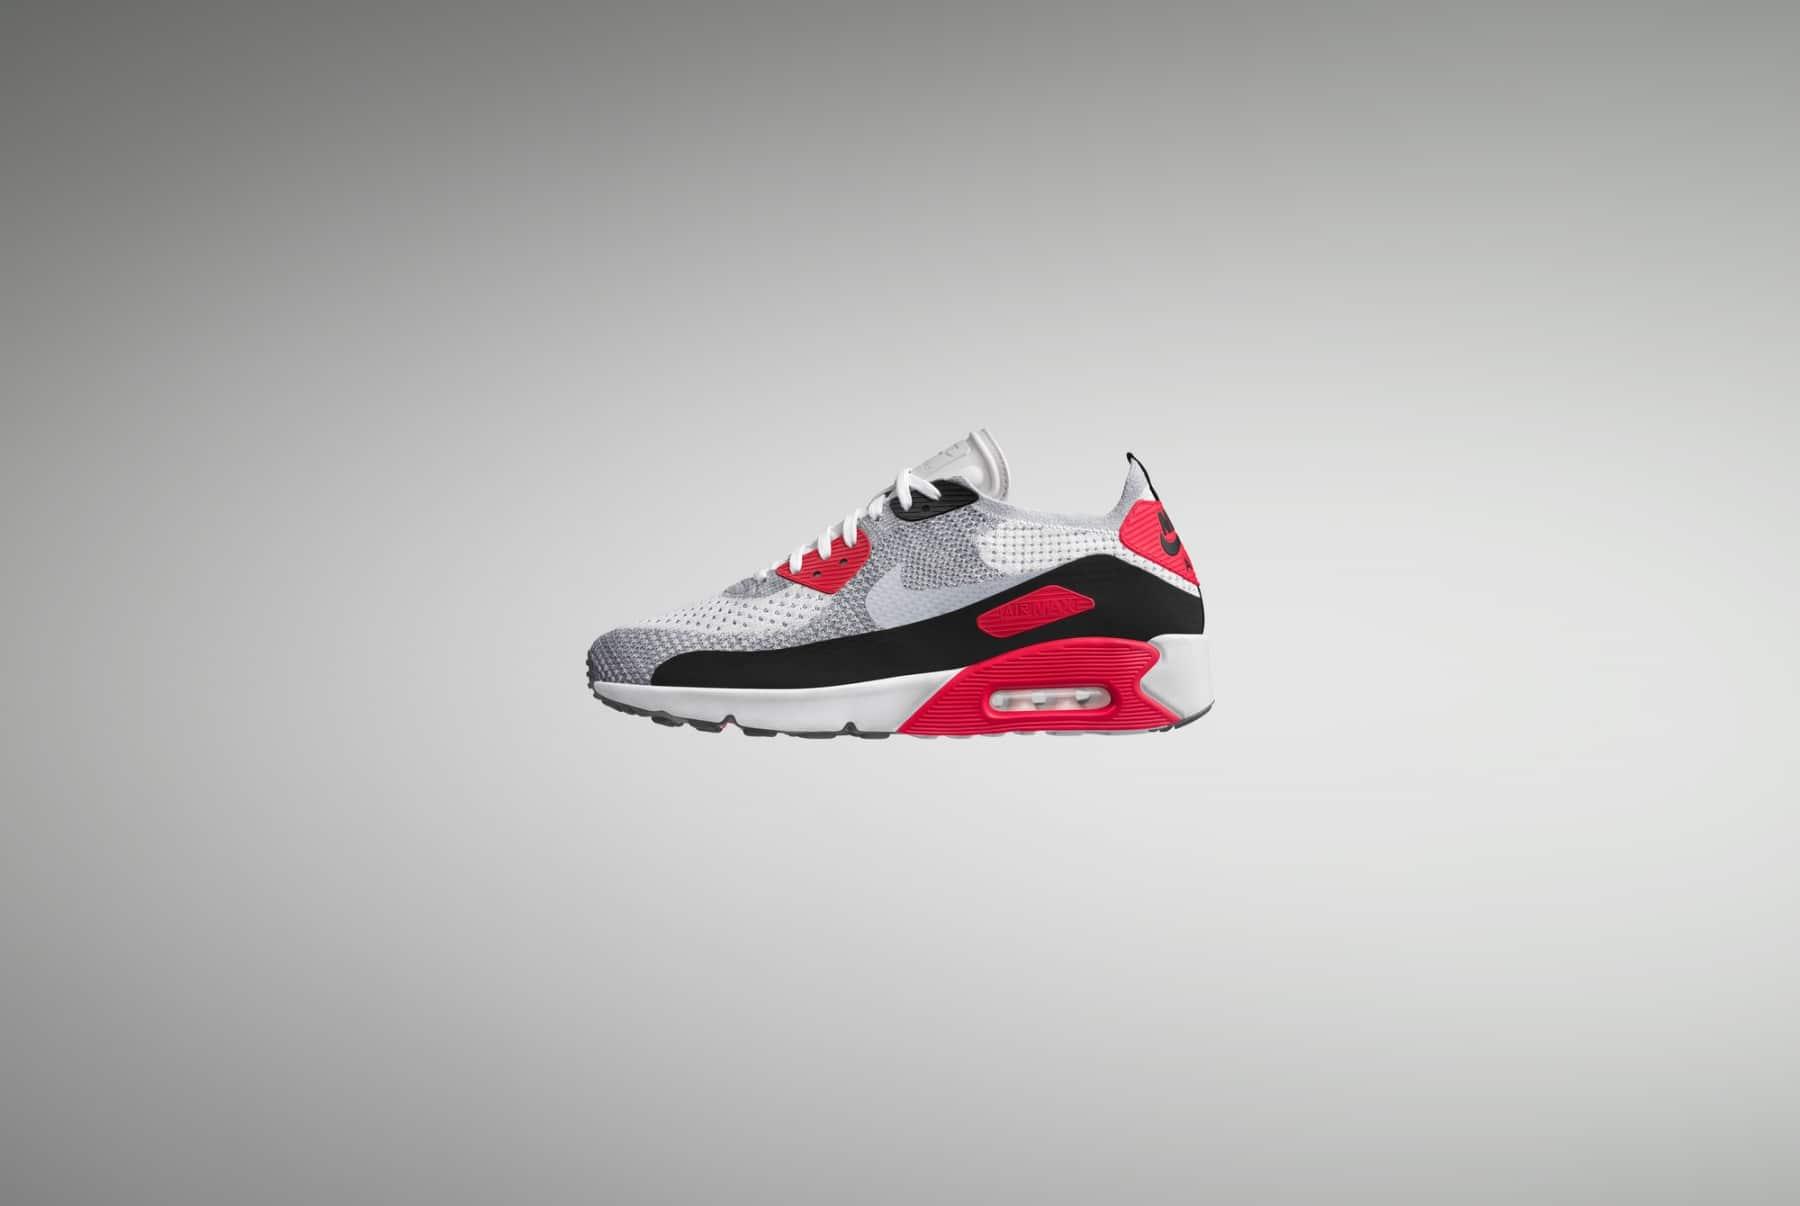 nike air max 90 ultra flyknit shoe